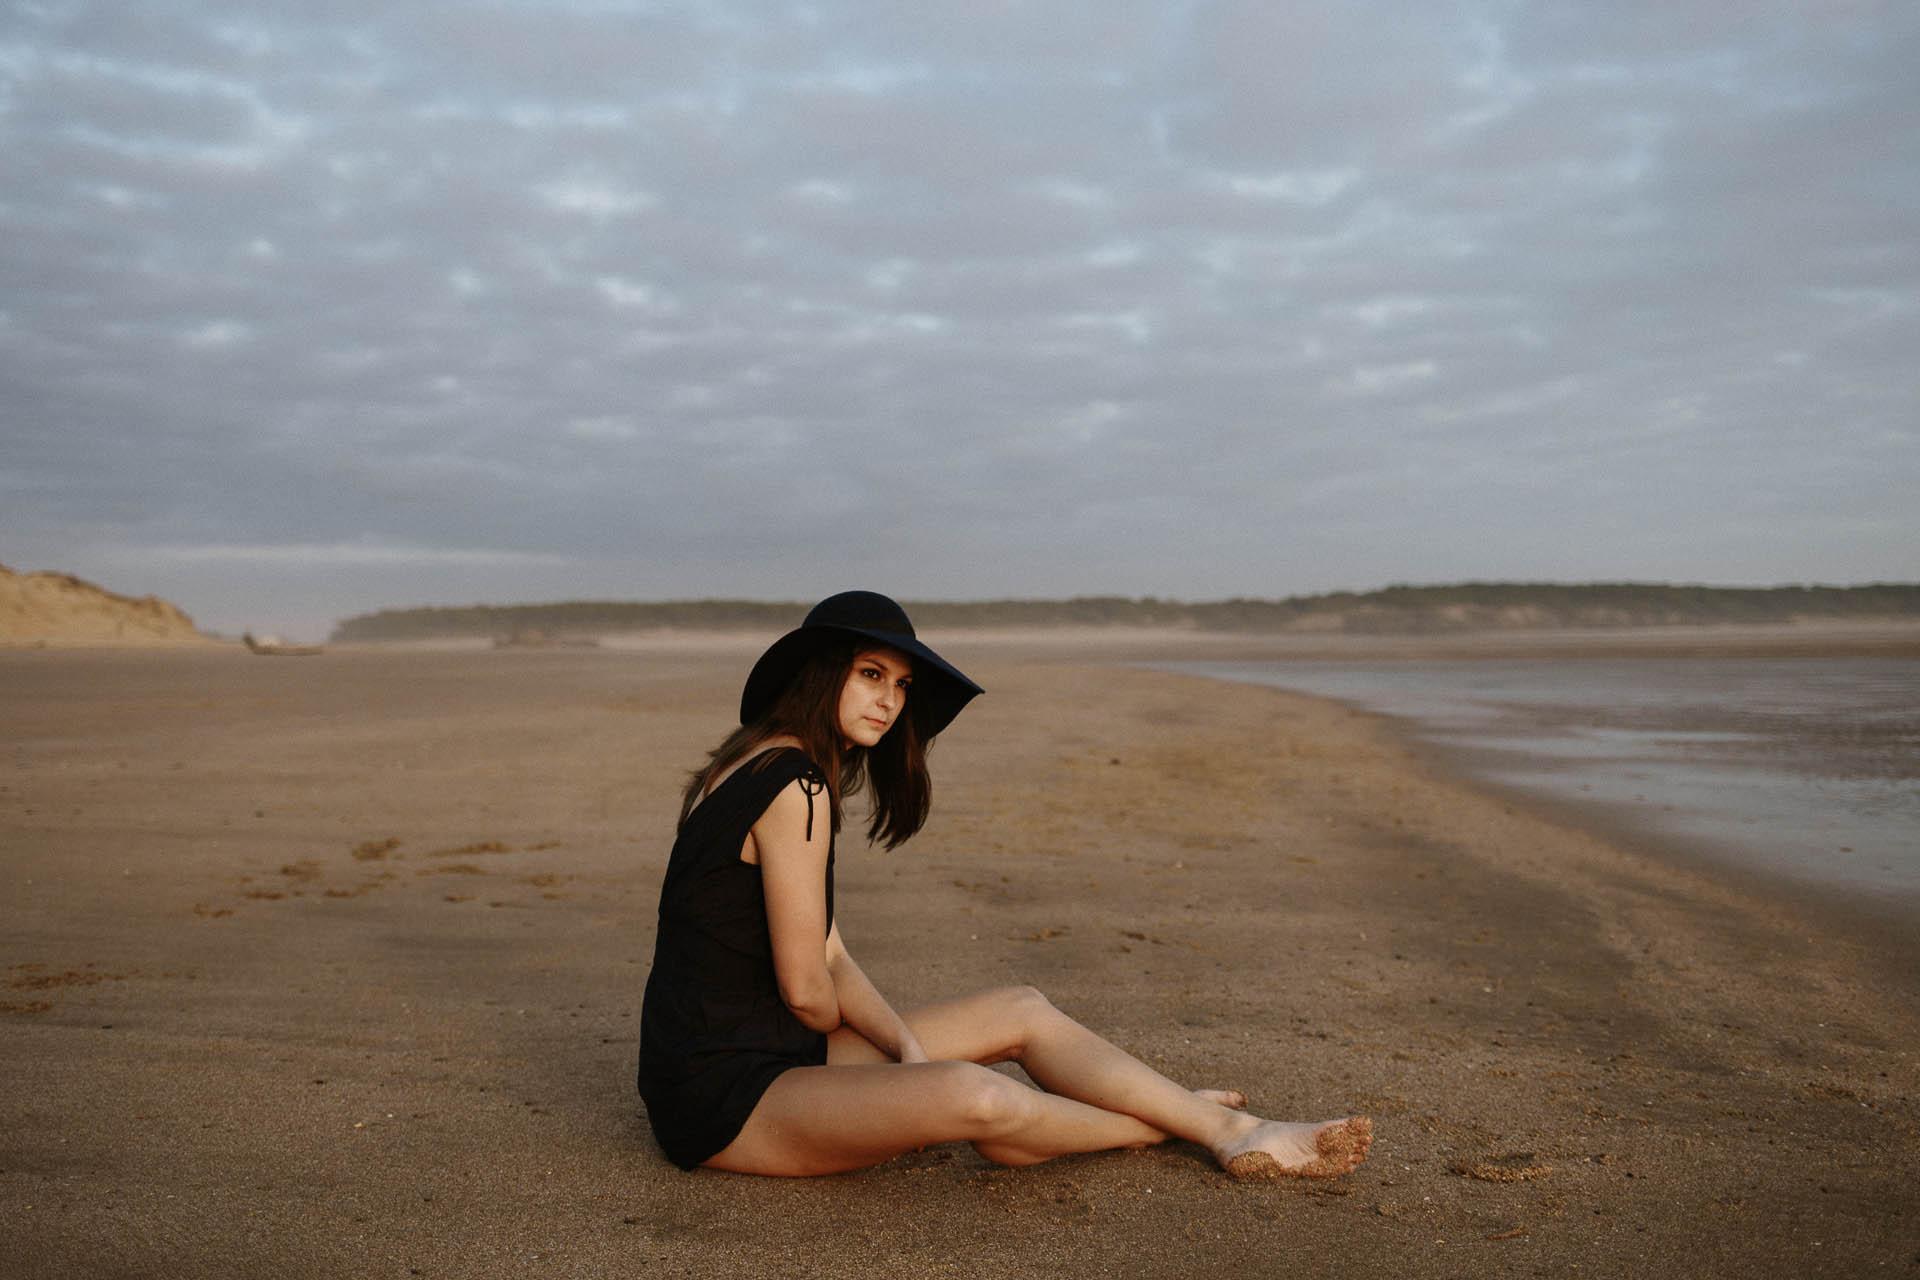 seance_portrait_marlene_vendee_flavie_nelly_paysage-117